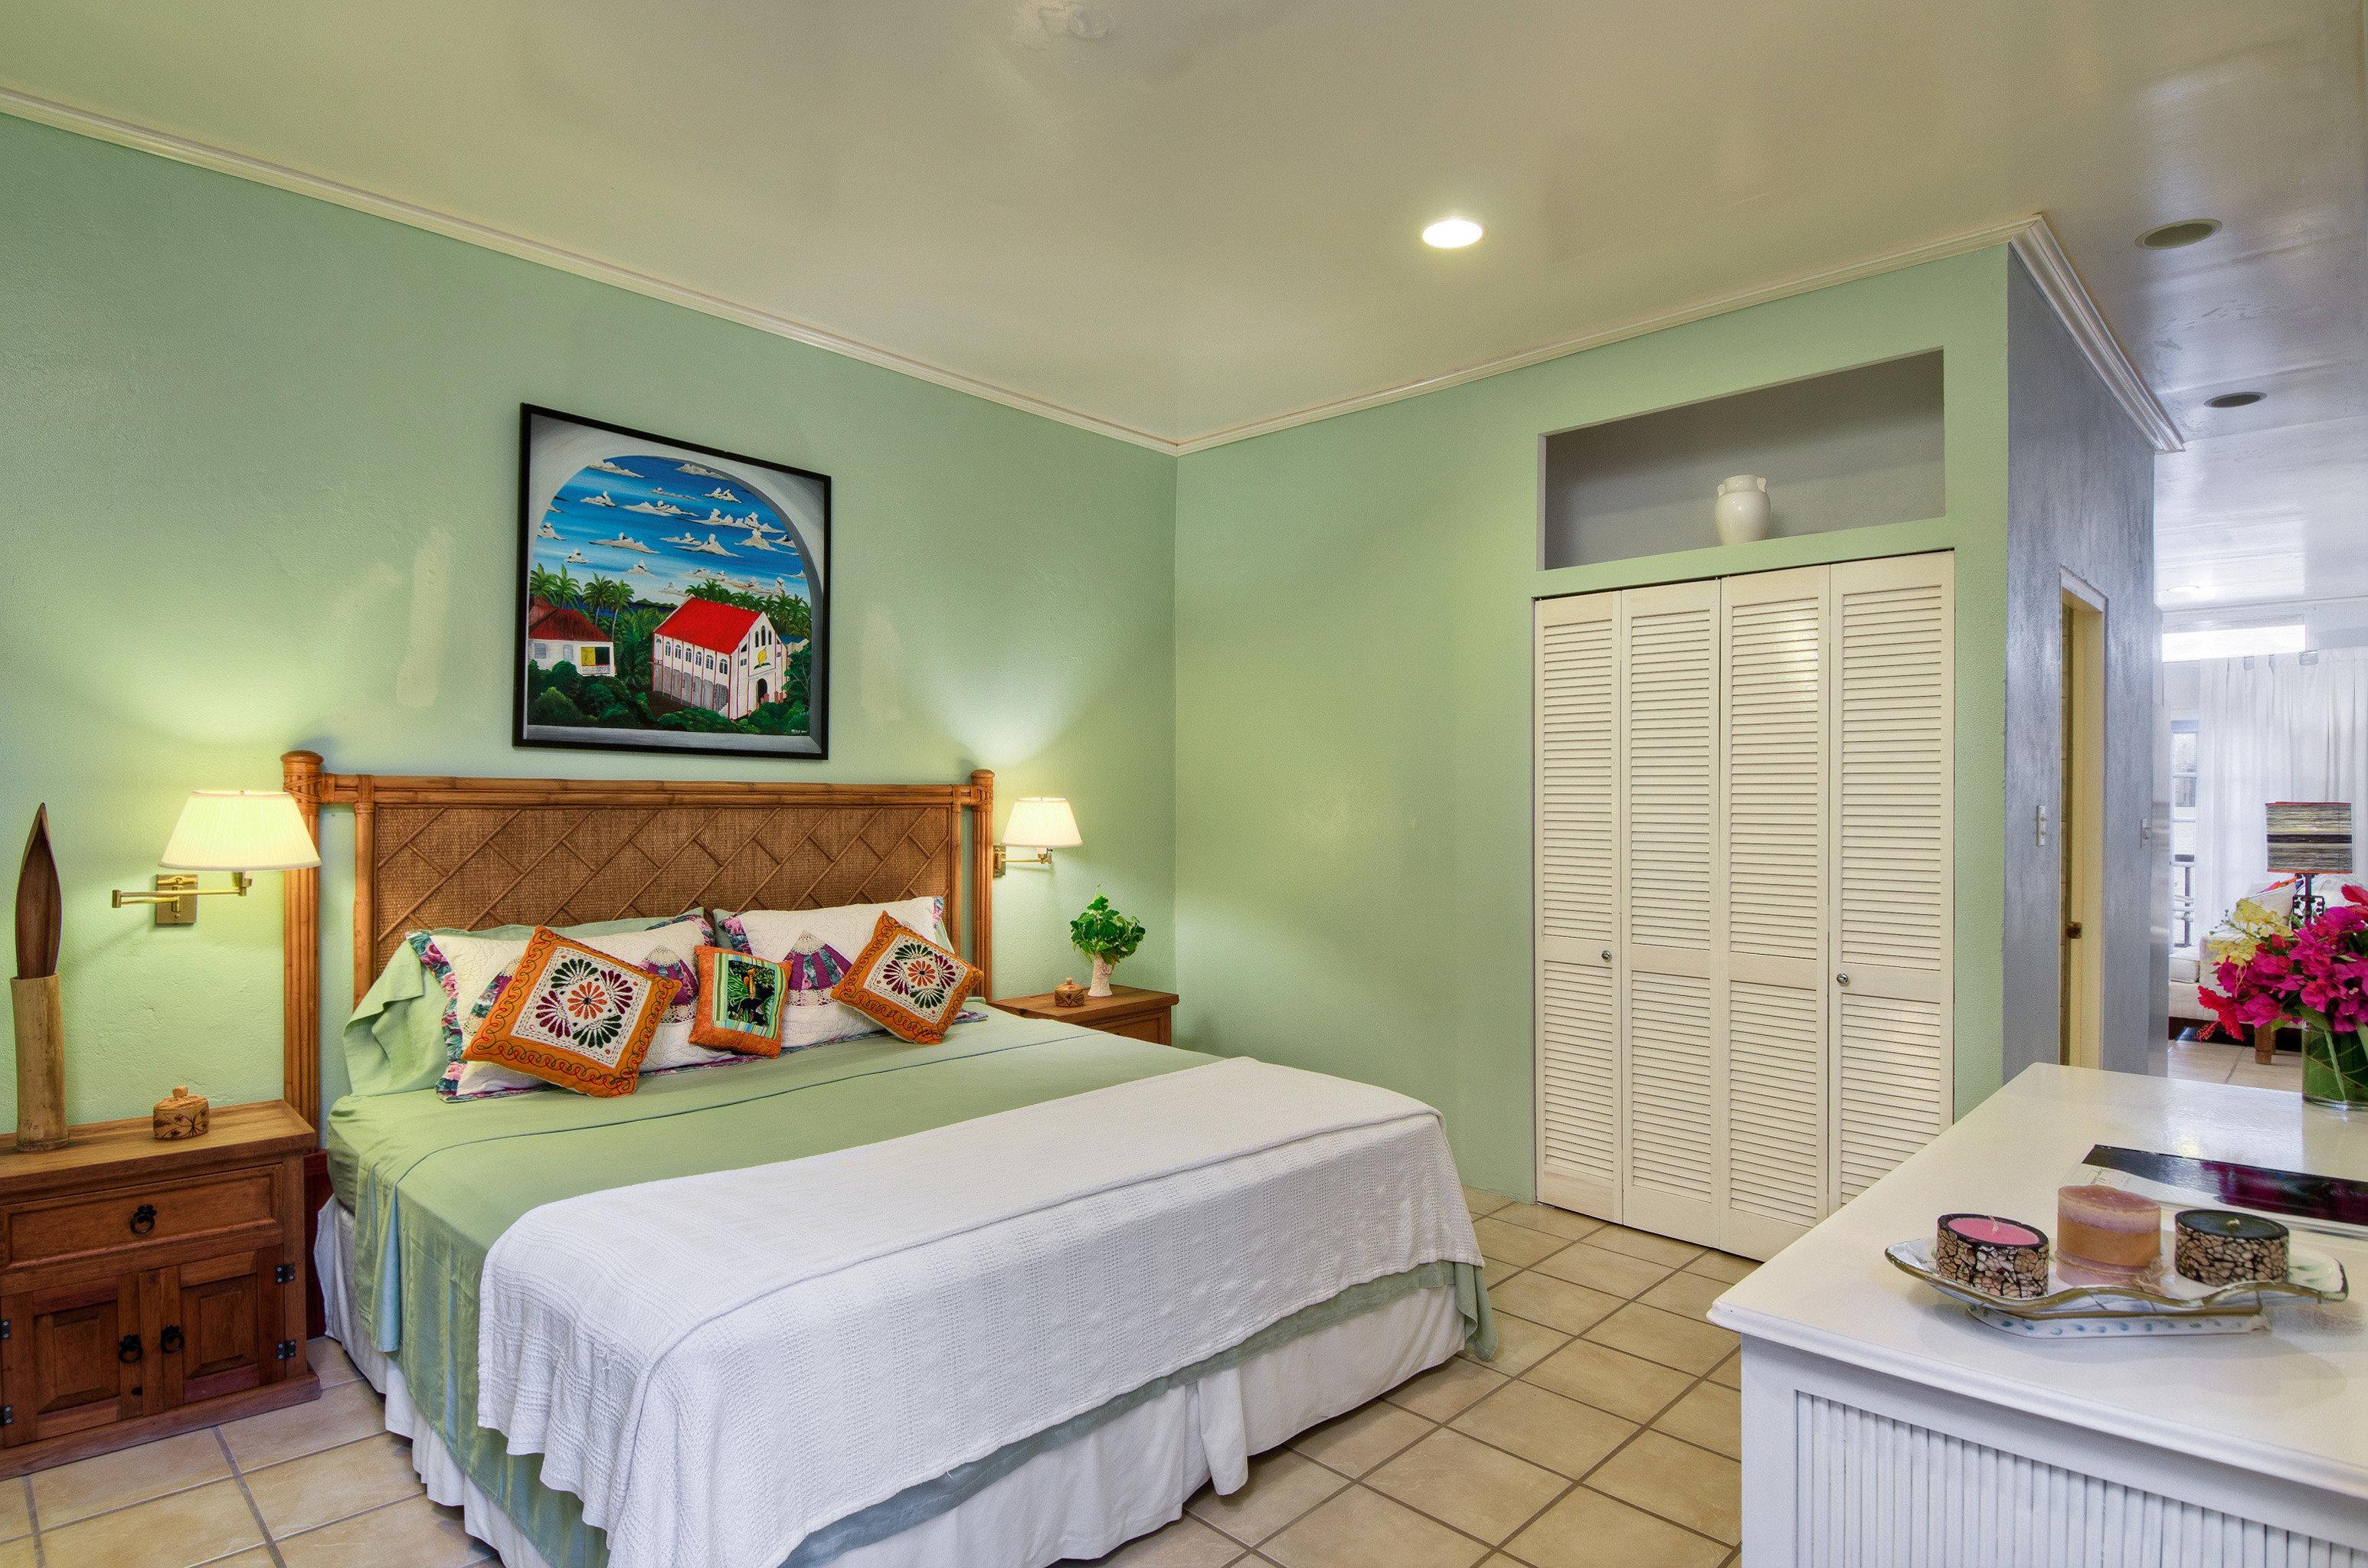 Bedroom Modern Suite property green home cottage